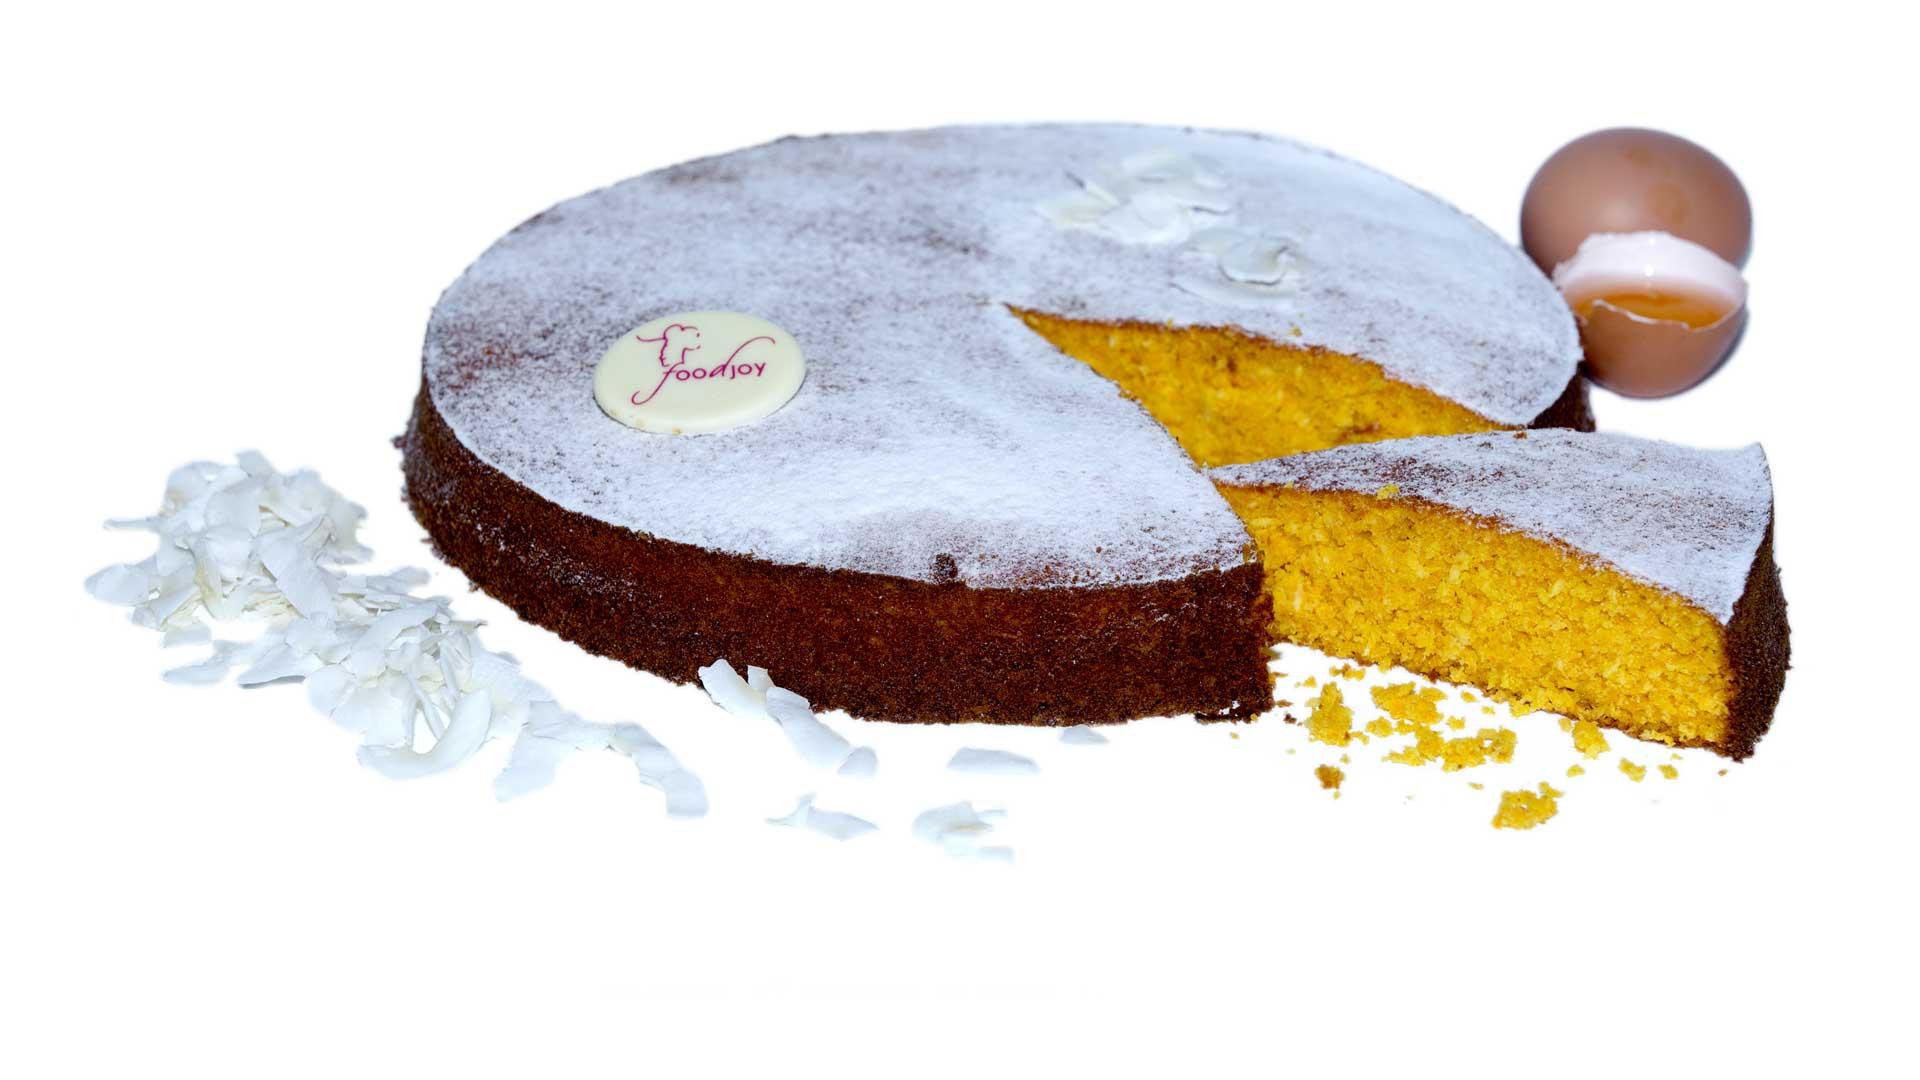 foodjoy-sweet-bakery-laboratorio-pasticceria-cantu-brioches-pasticcini-torte-caffe-torta-alla-zucca-001